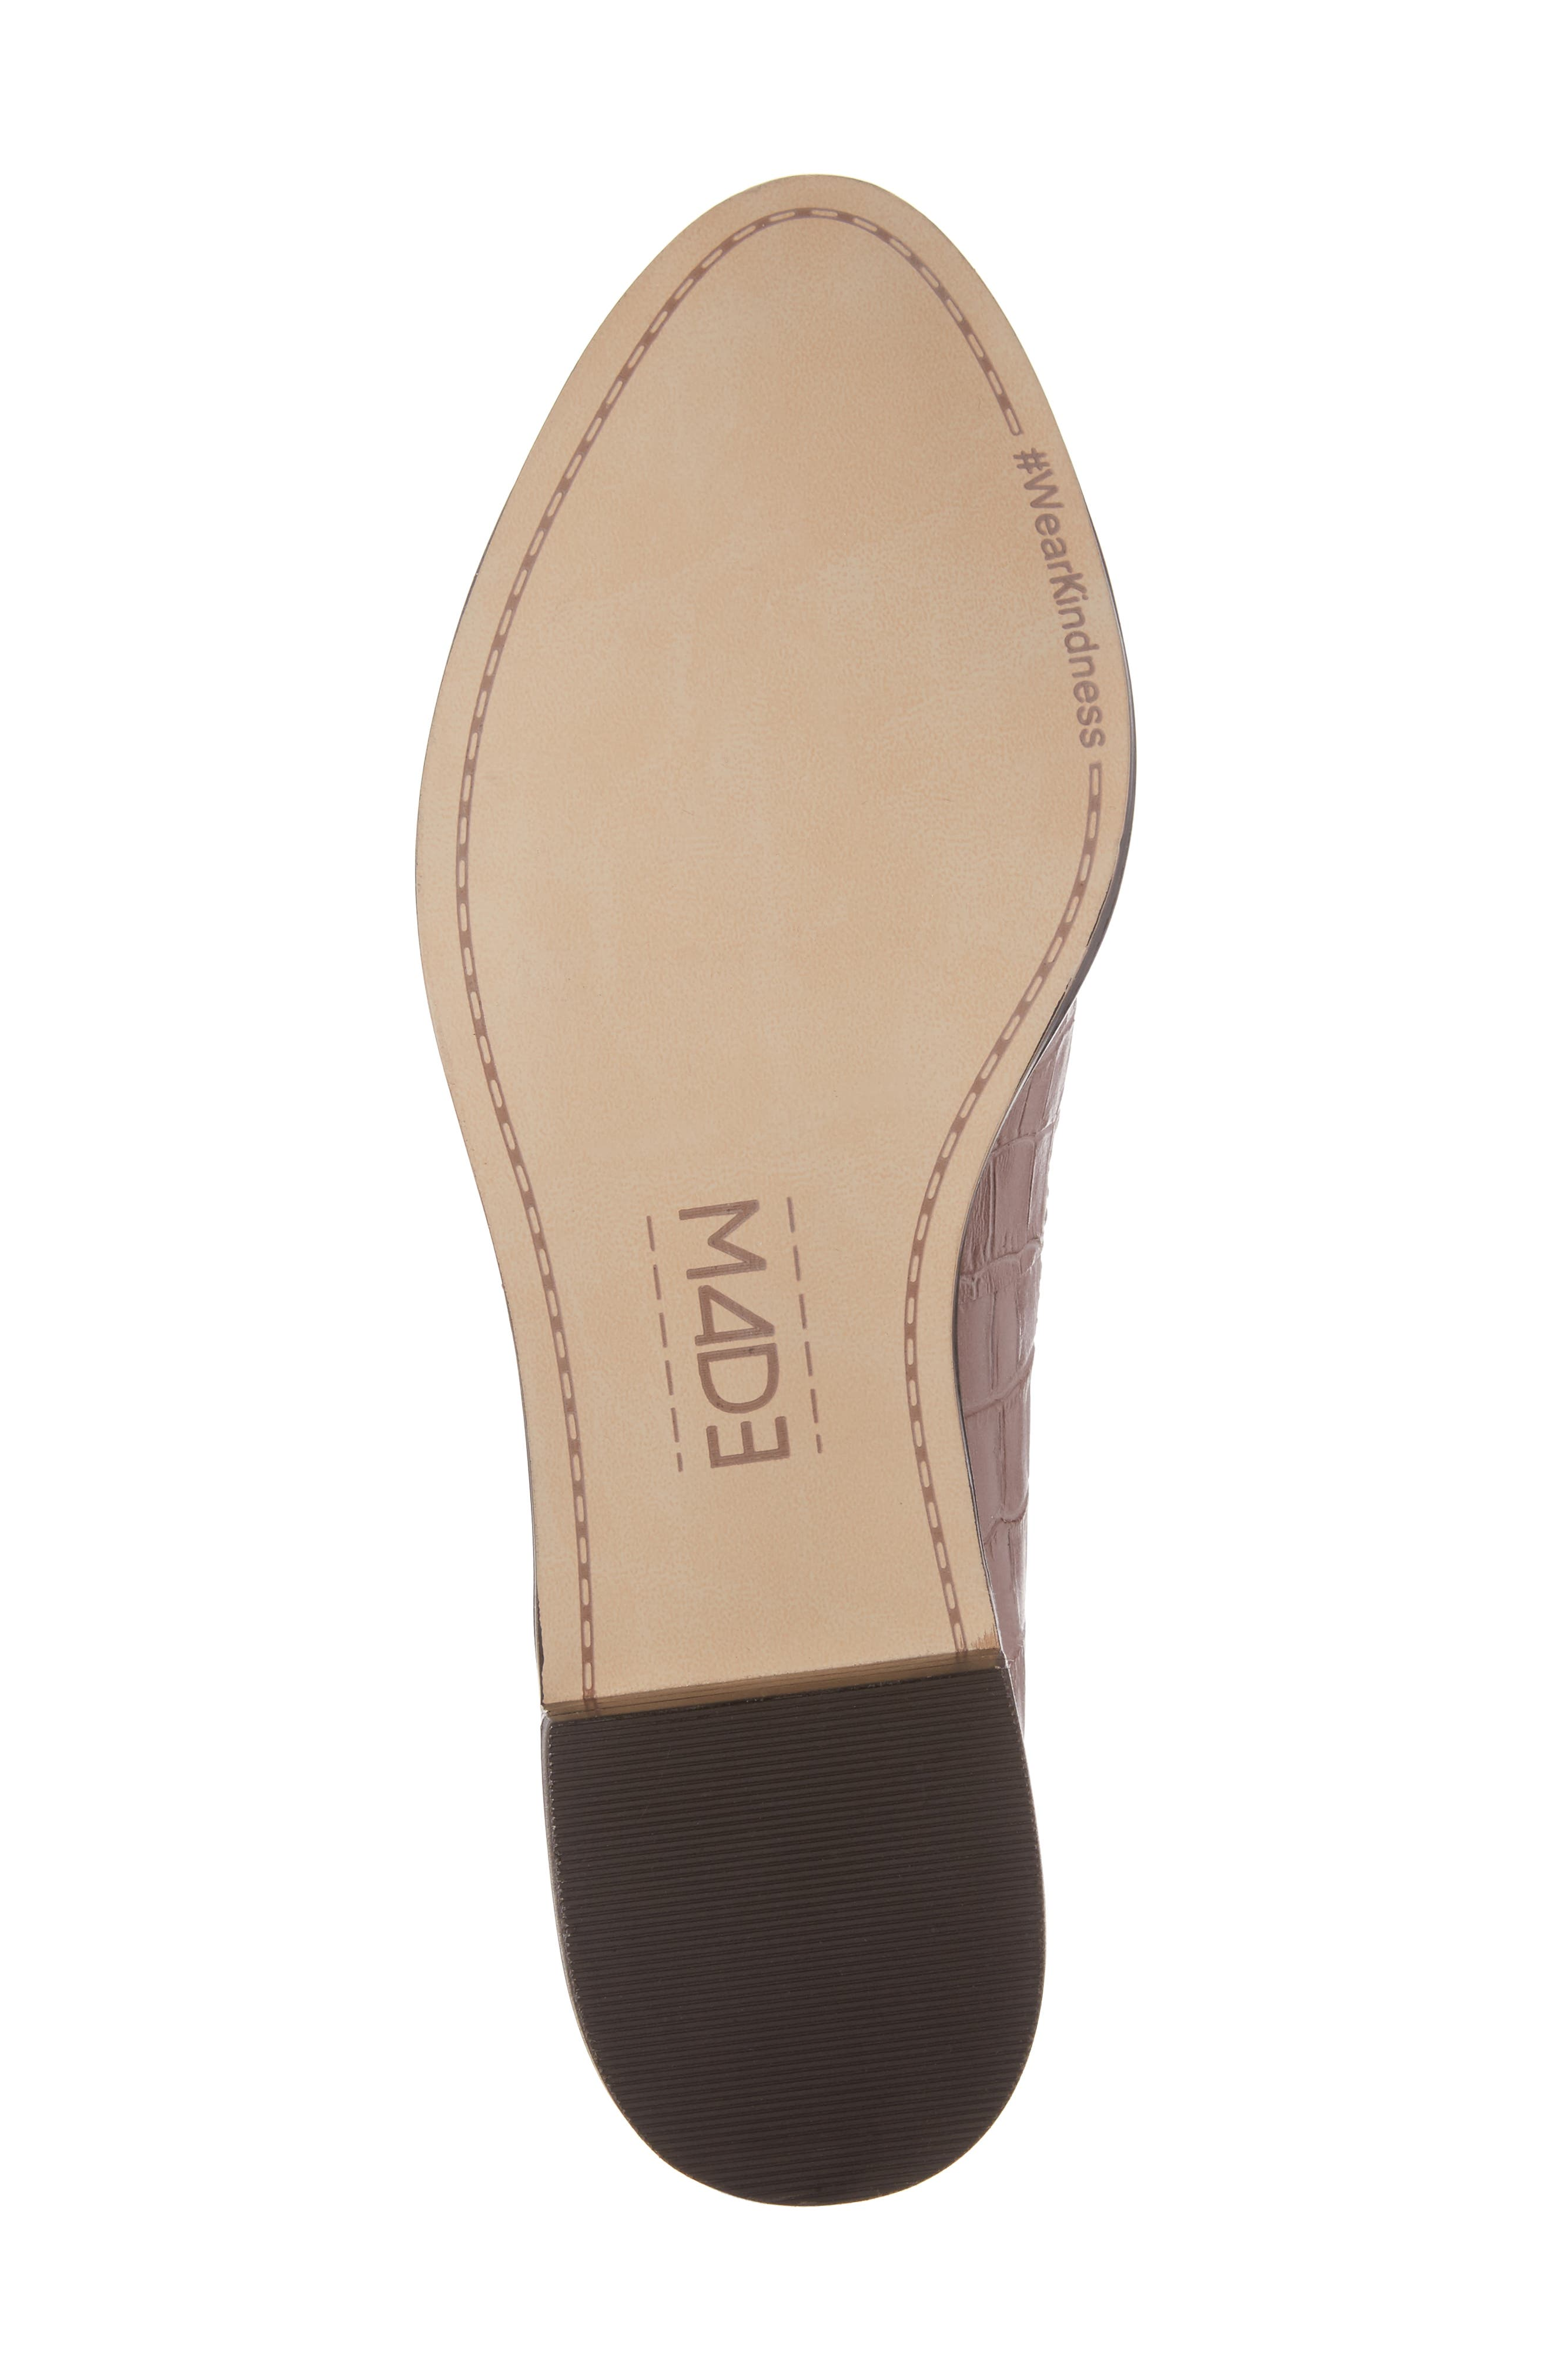 M4D3 'Ocean' Flat Loafer,                             Alternate thumbnail 30, color,